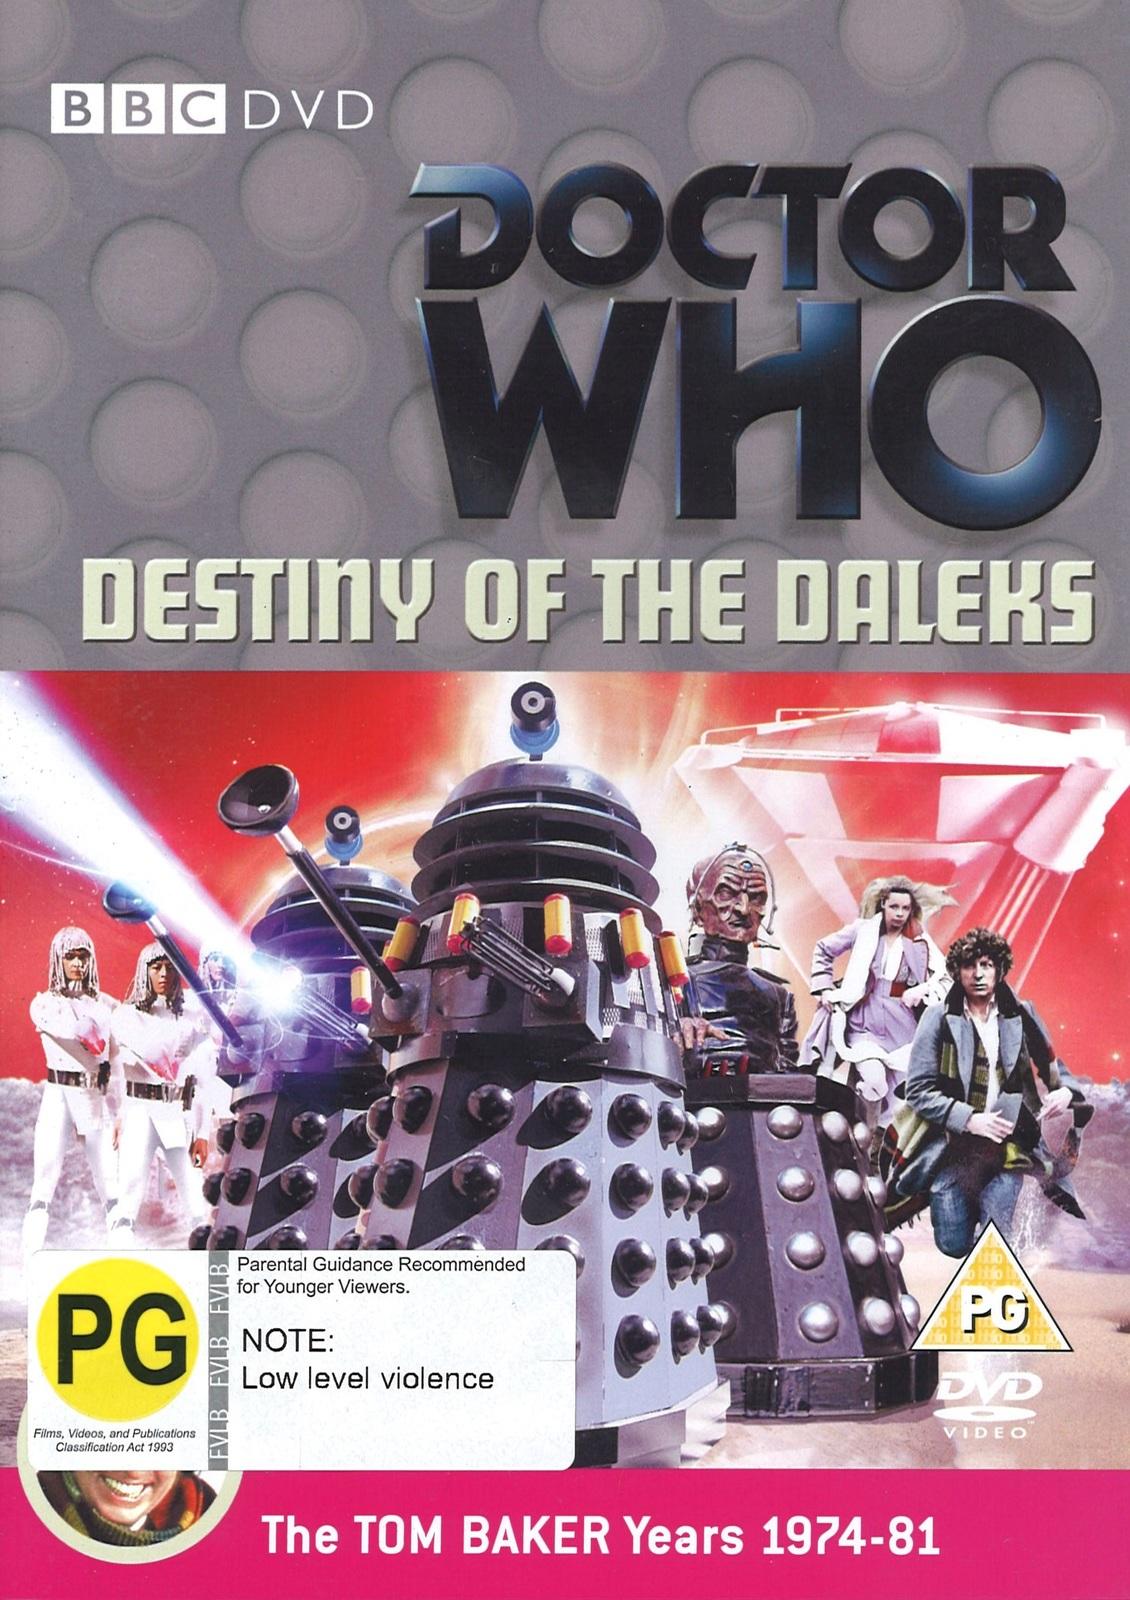 Doctor Who: Destiny of the Daleks on DVD image